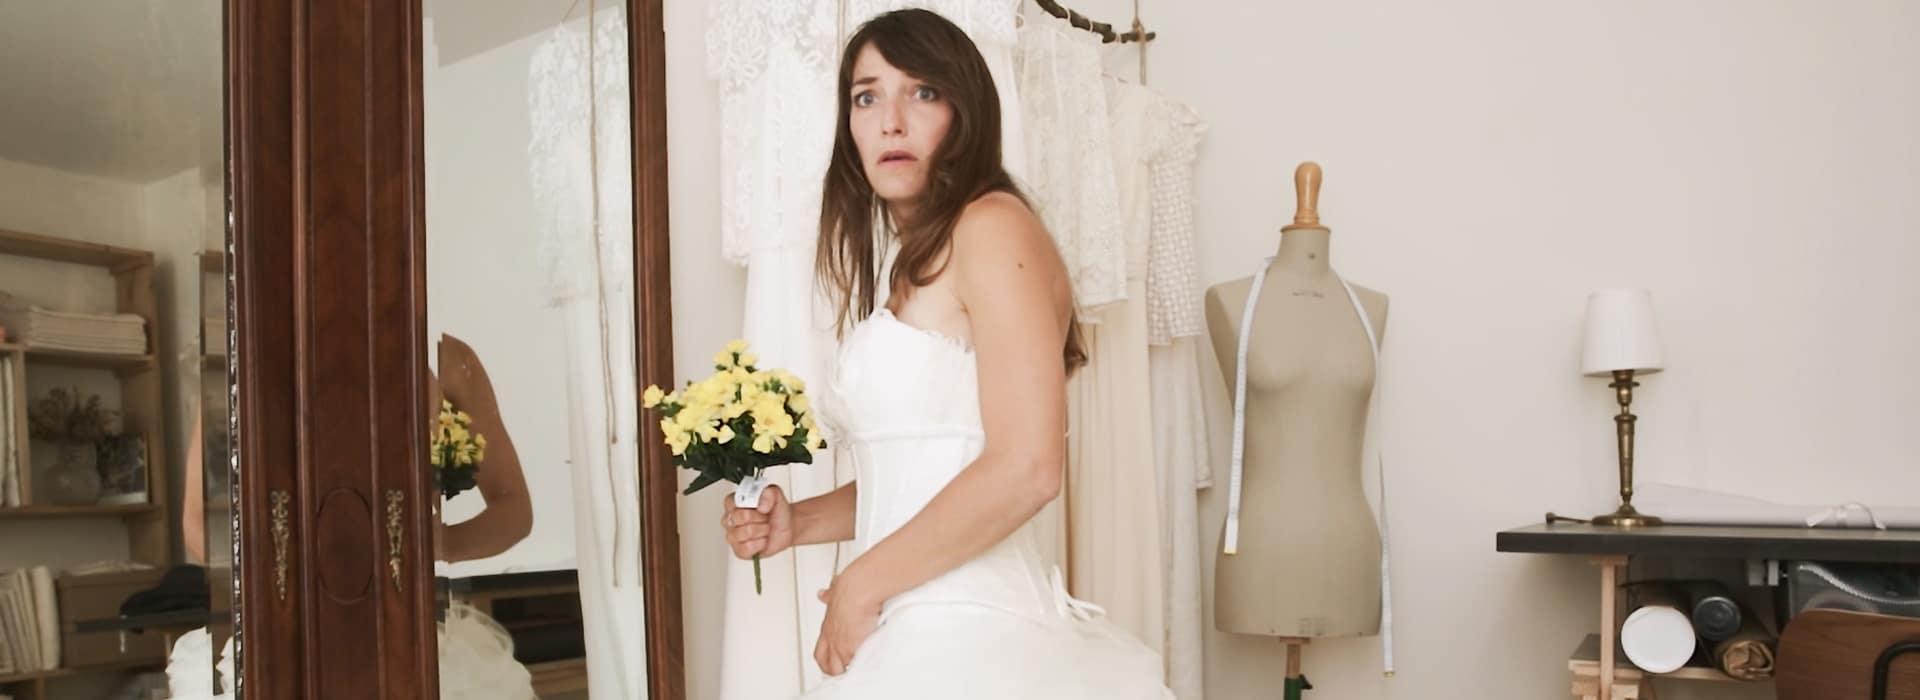 mariage contrat site